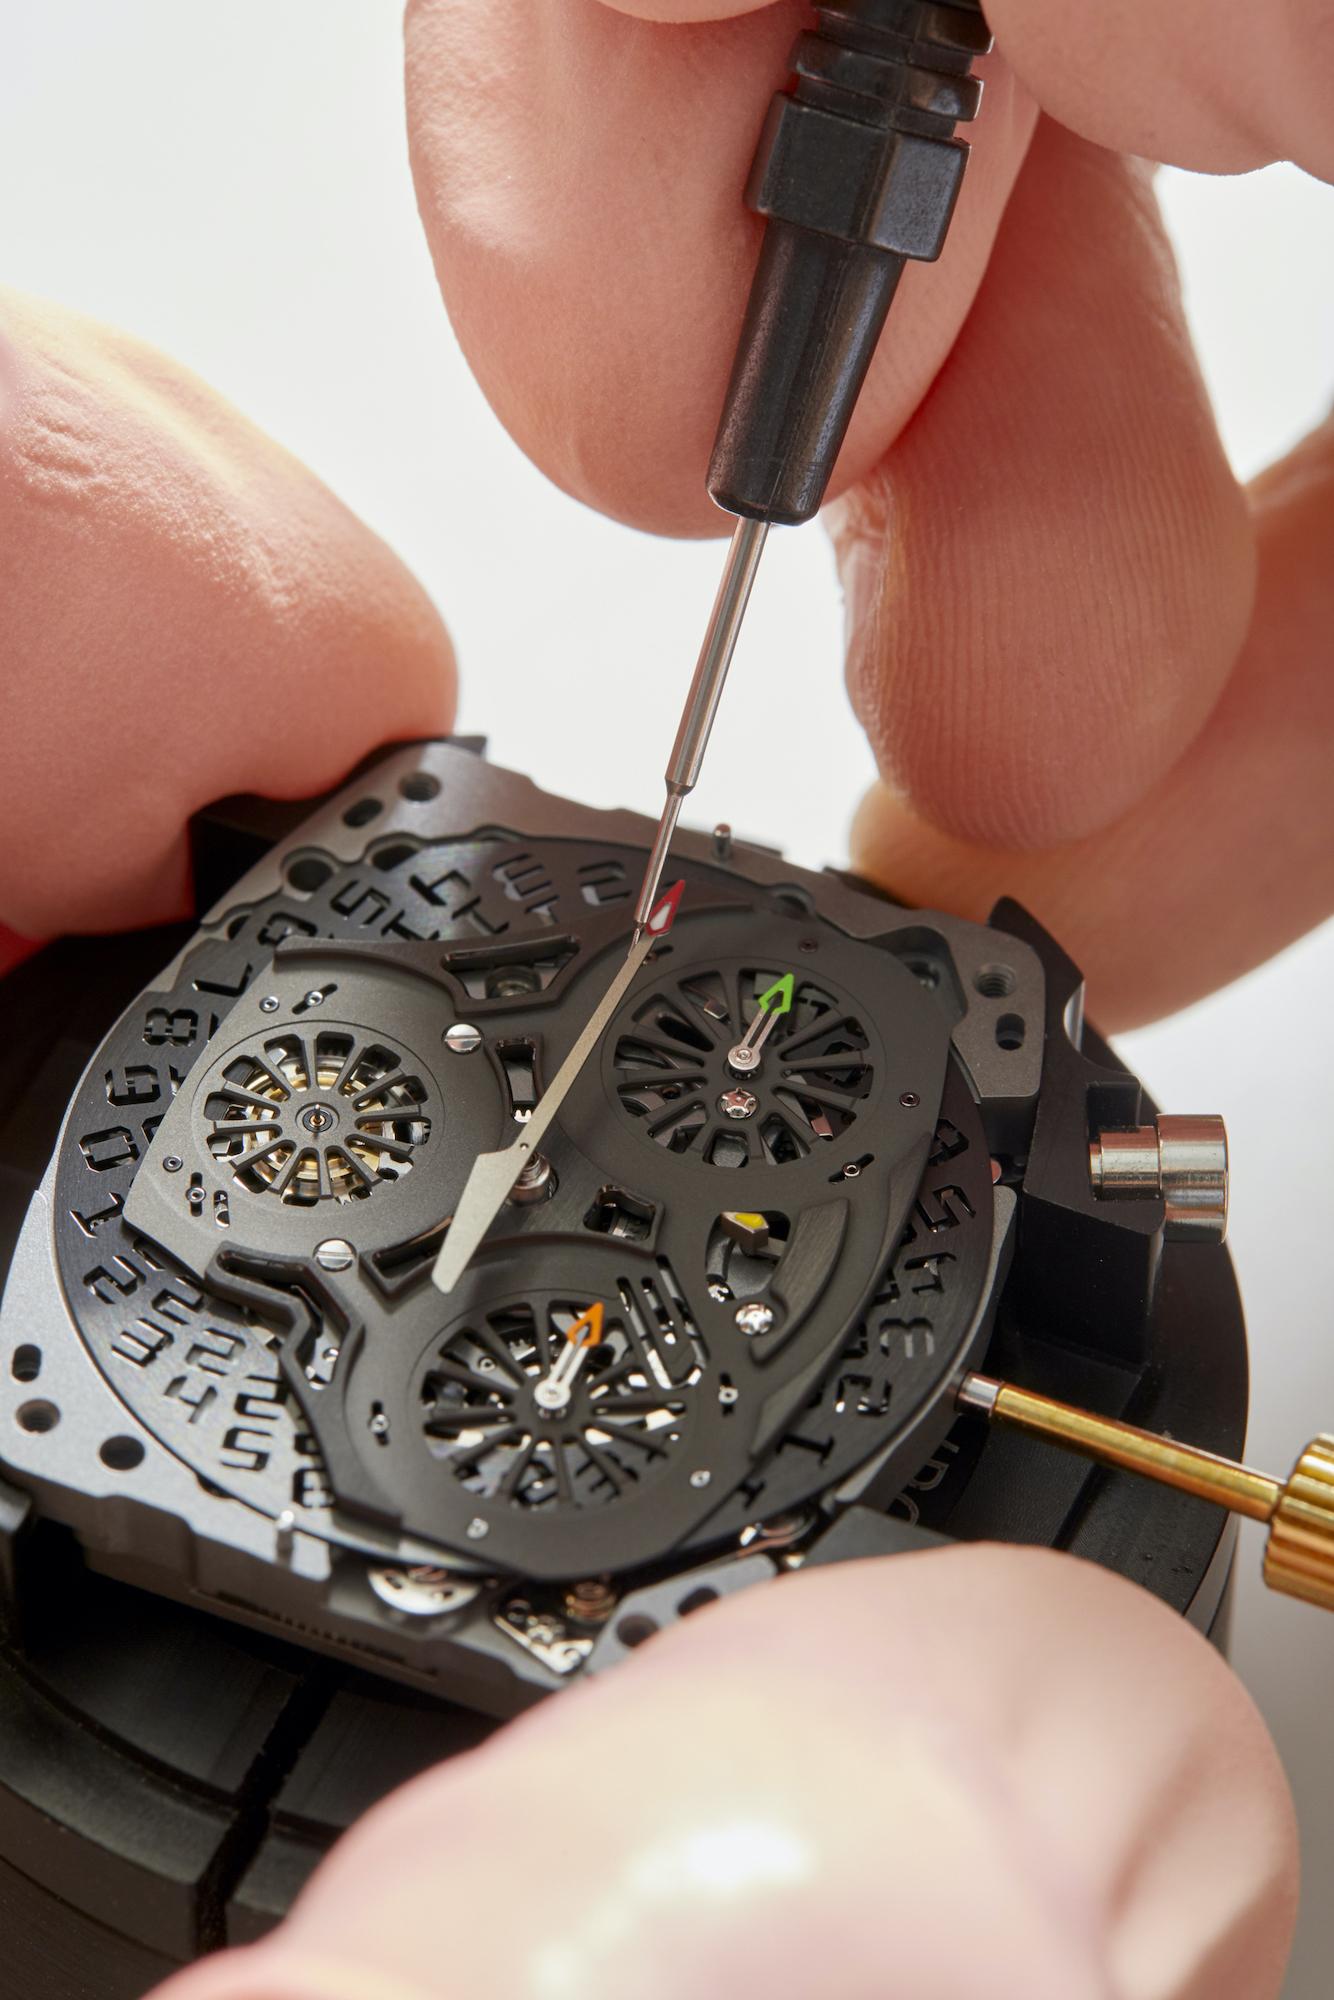 Richard Mille RM 72-01 Lifestyle Chronograph detalle ensamblaje de agujas